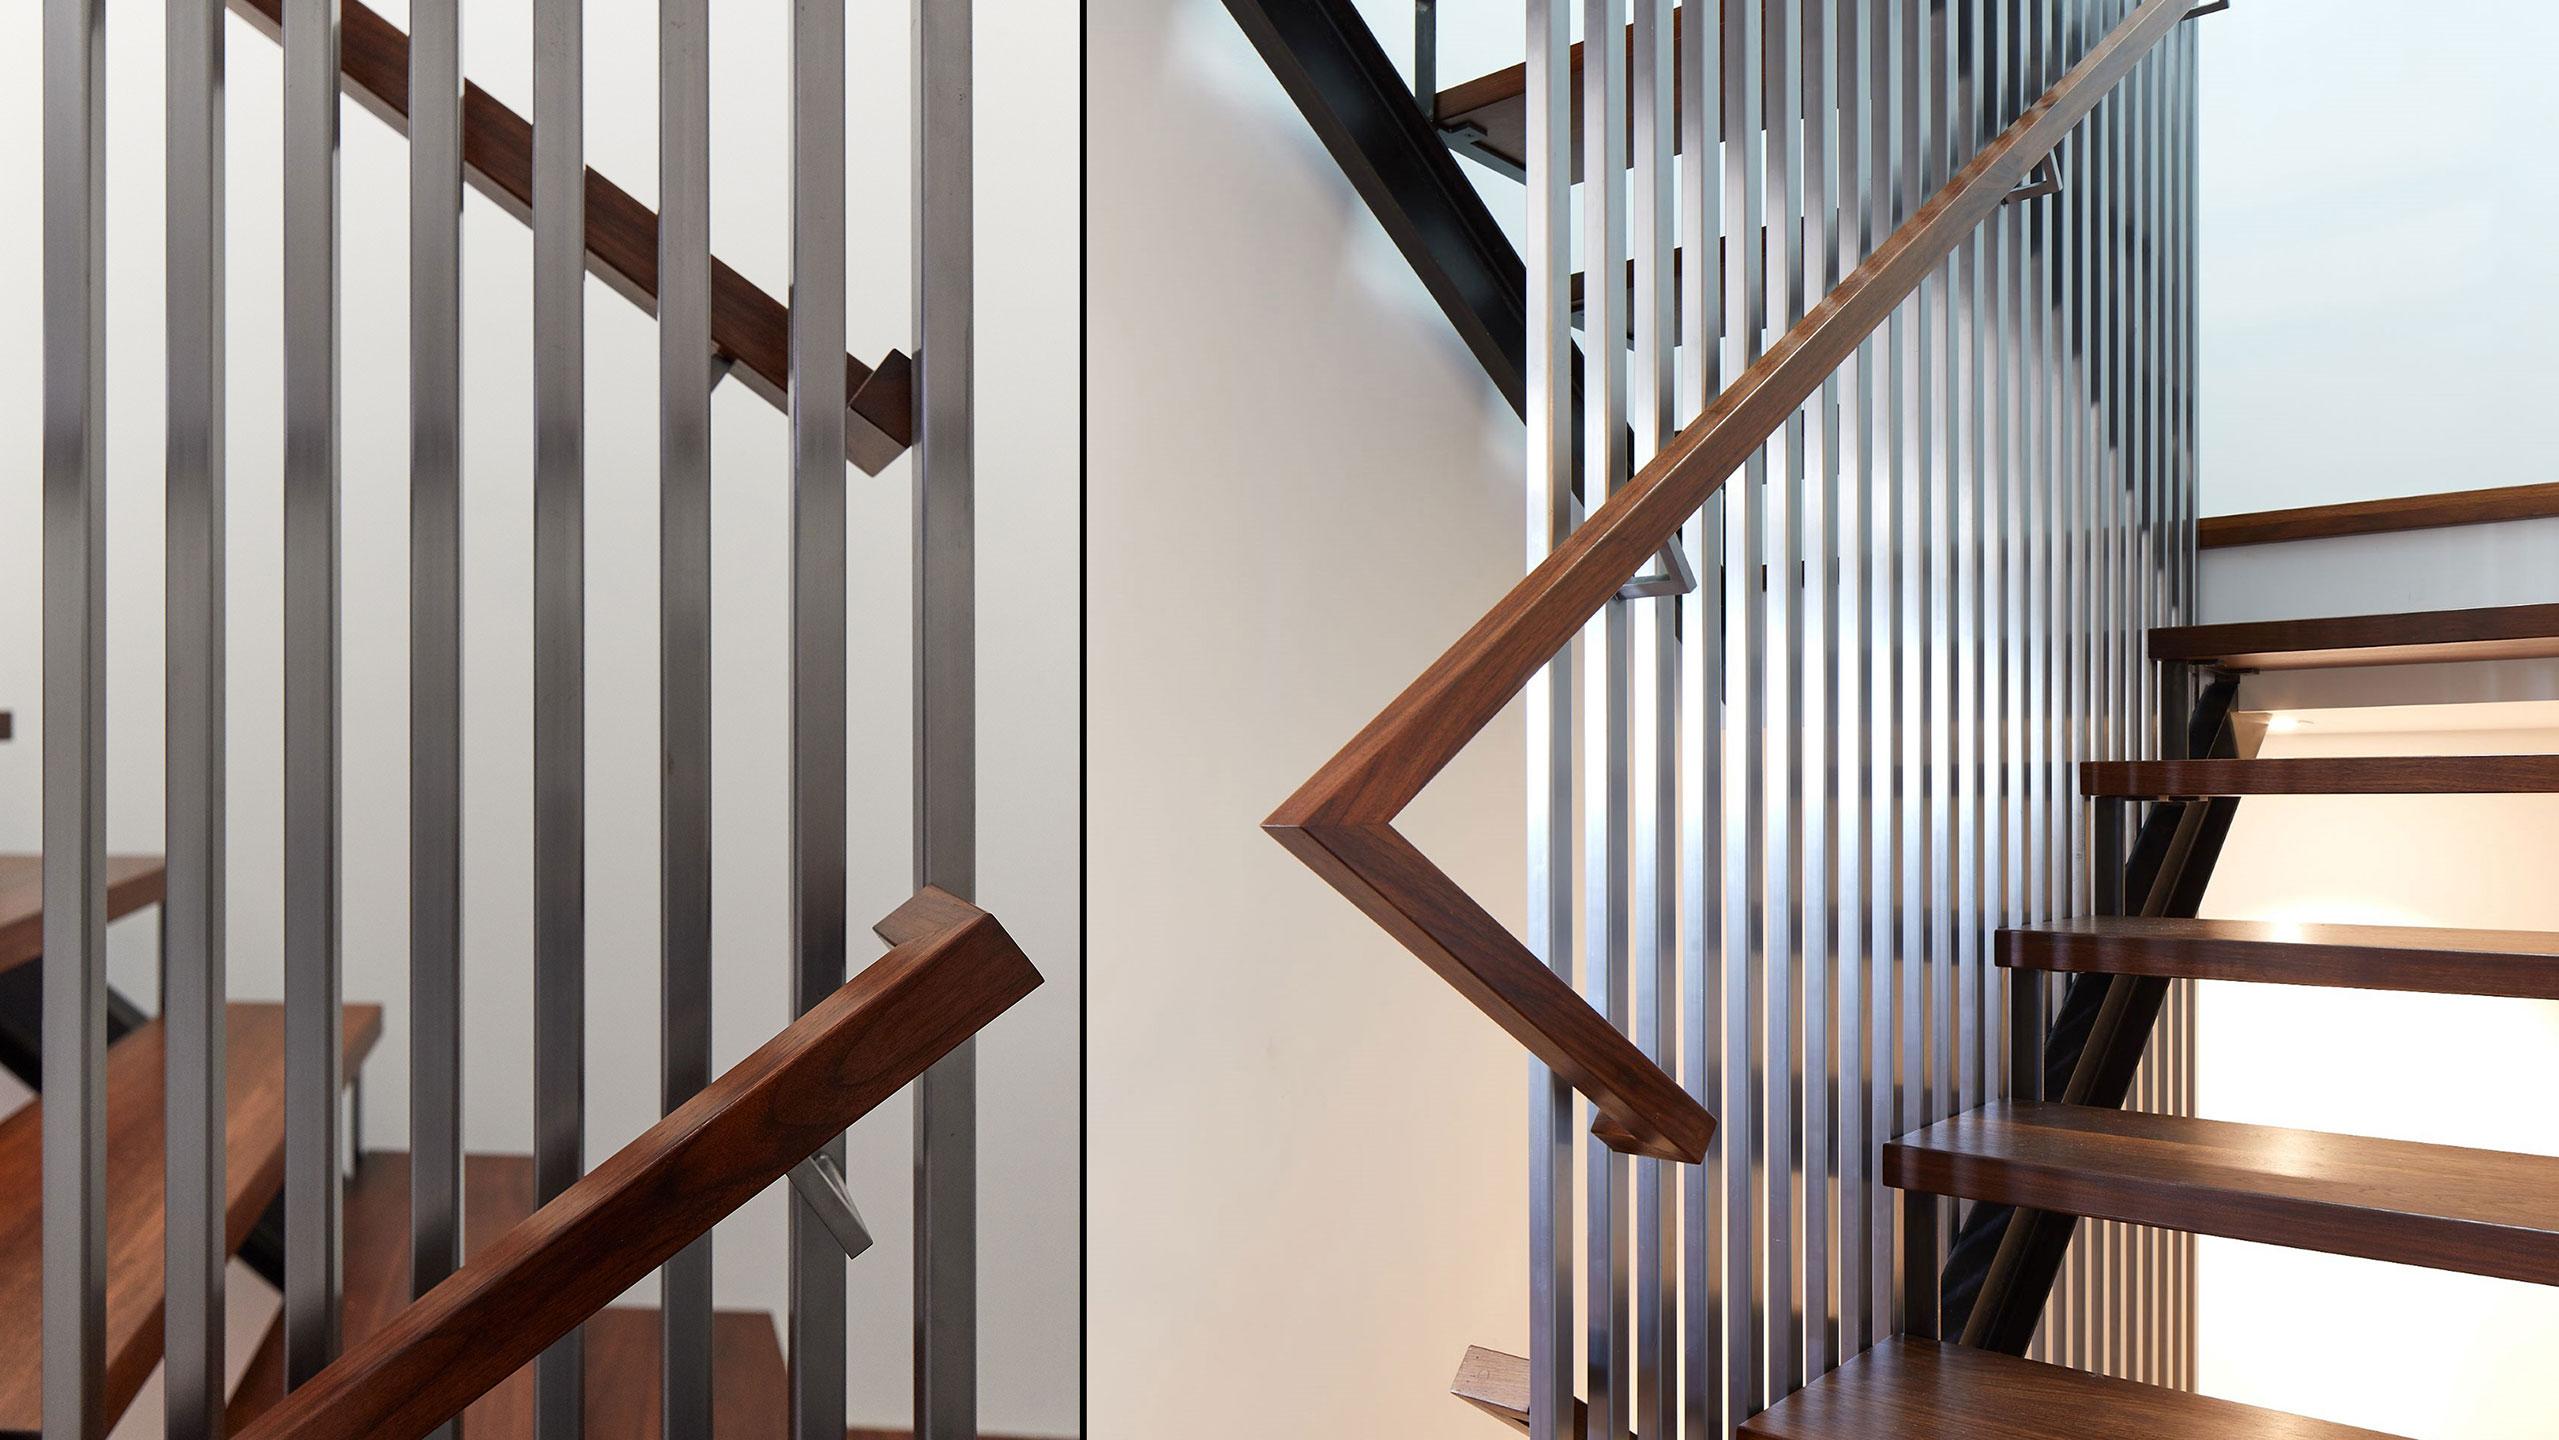 Farmhouse Interior Design Sonoma County 10 custom staircase design